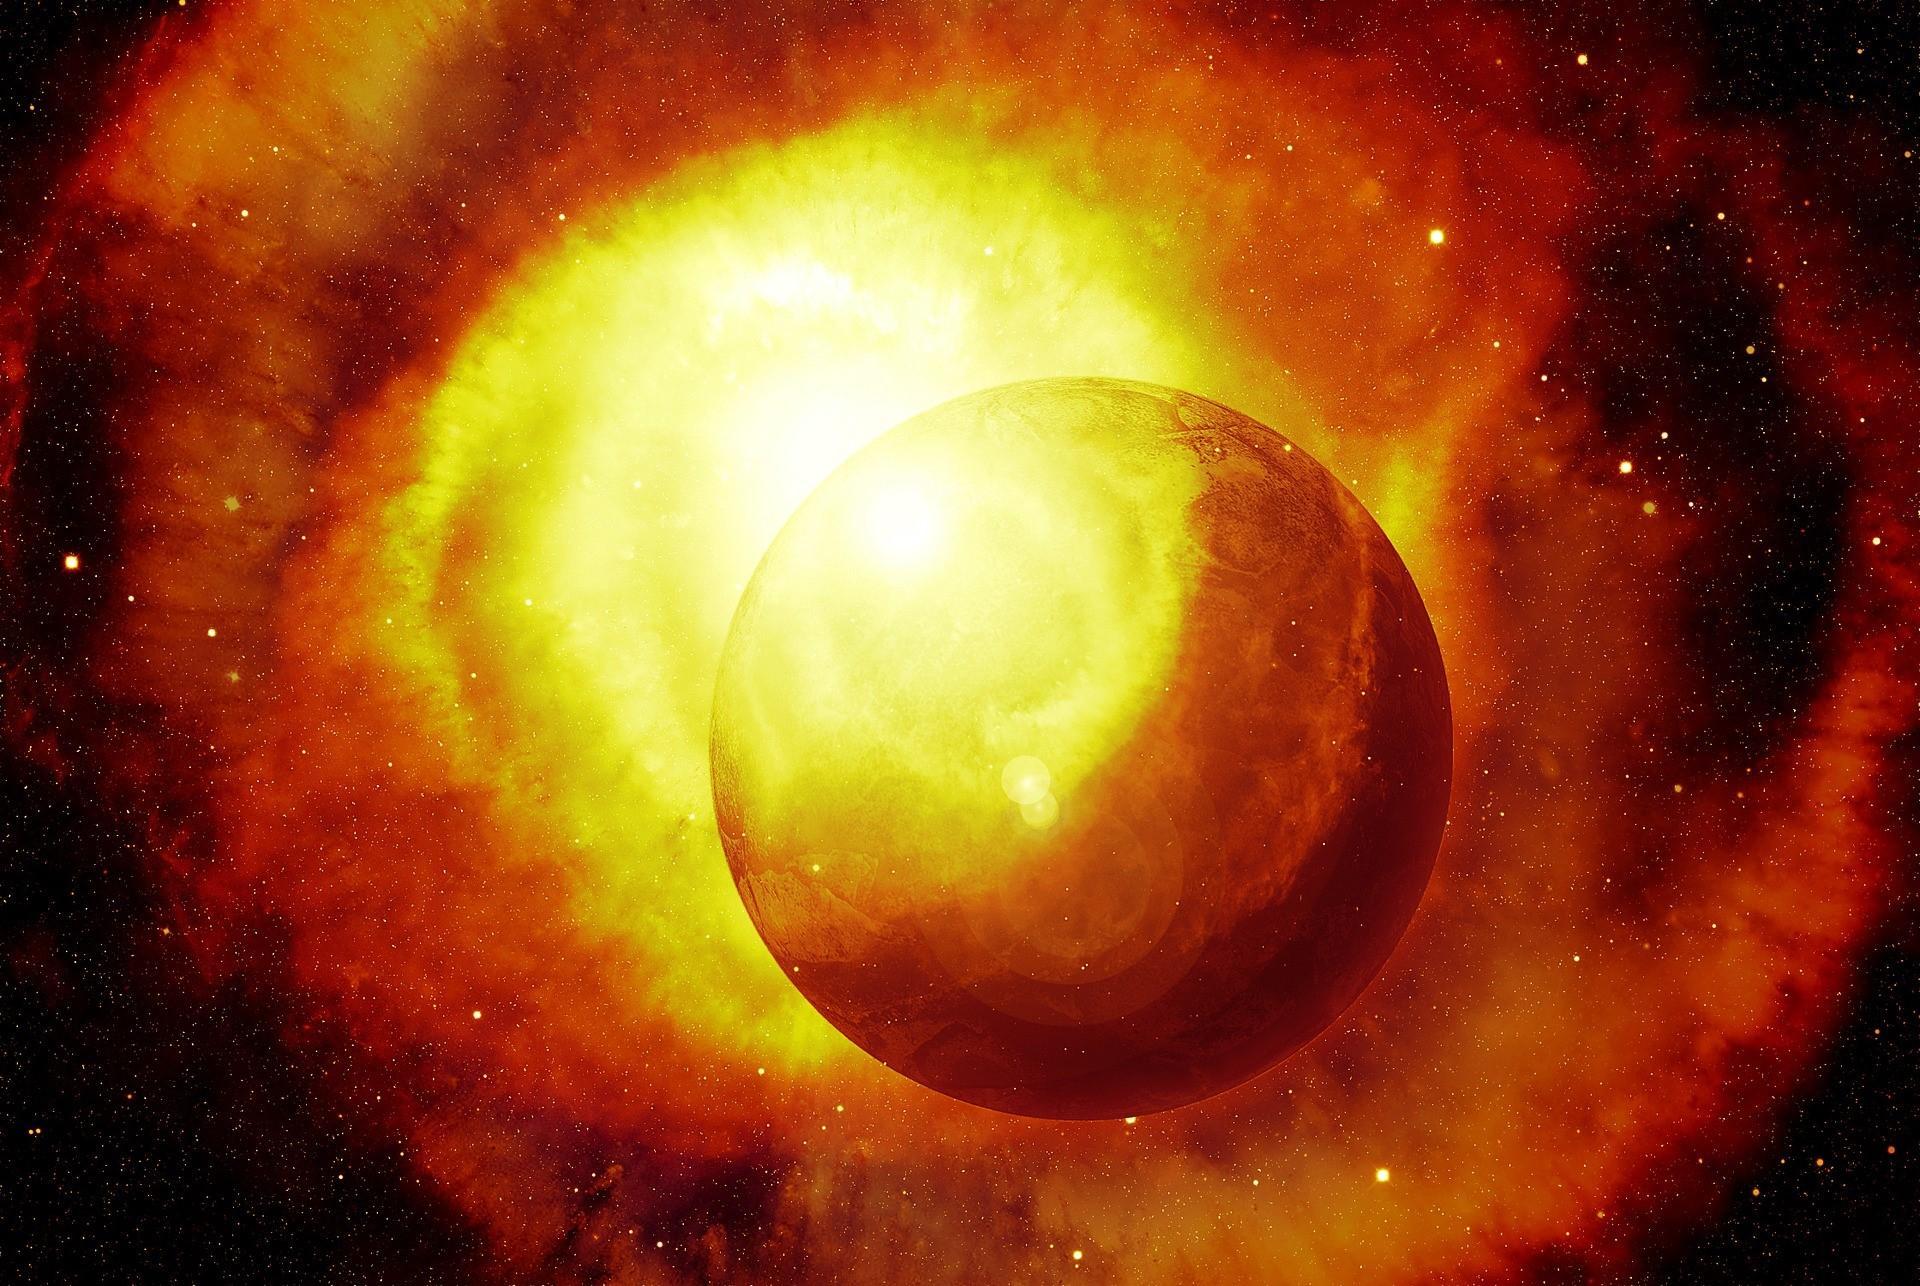 нибиру, россия, конец света, видео, происшествия, новости науки, космос, звезда смерти, планета-убийца, планета х